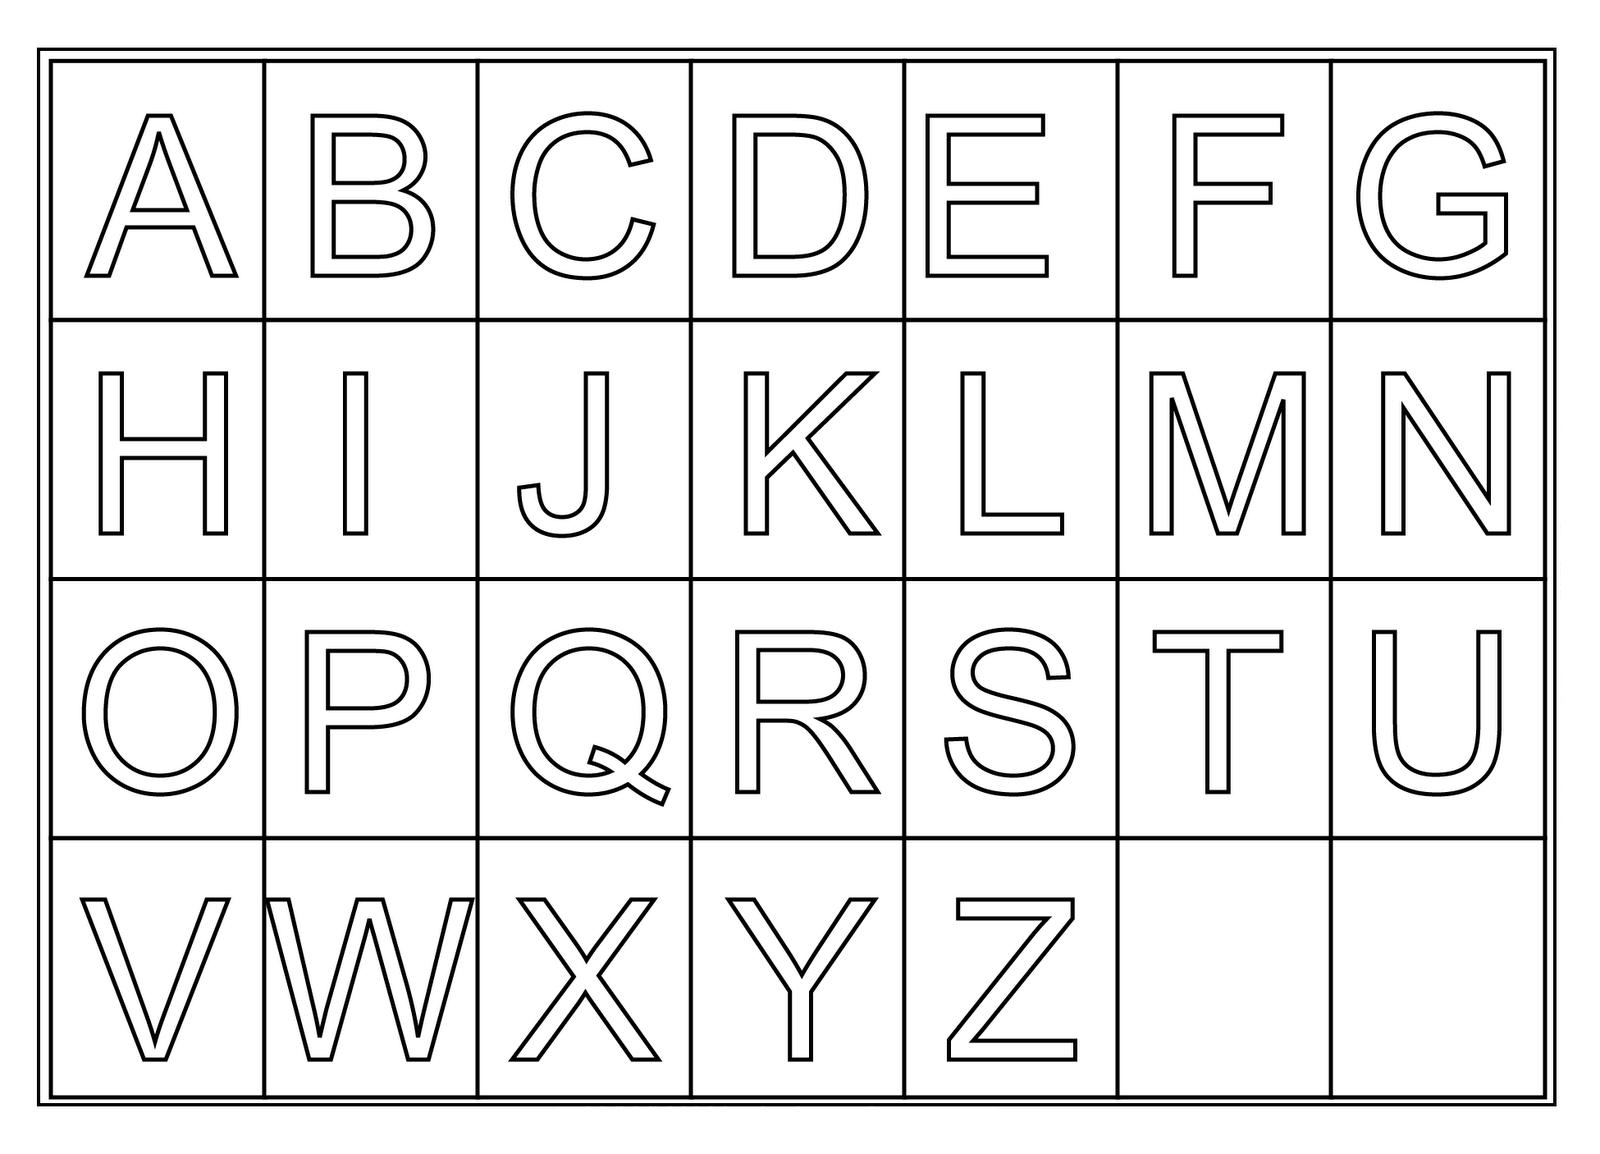 Free Printable Letter Displays | - Clip Art Library - Free Printable Alphabet Letters For Display